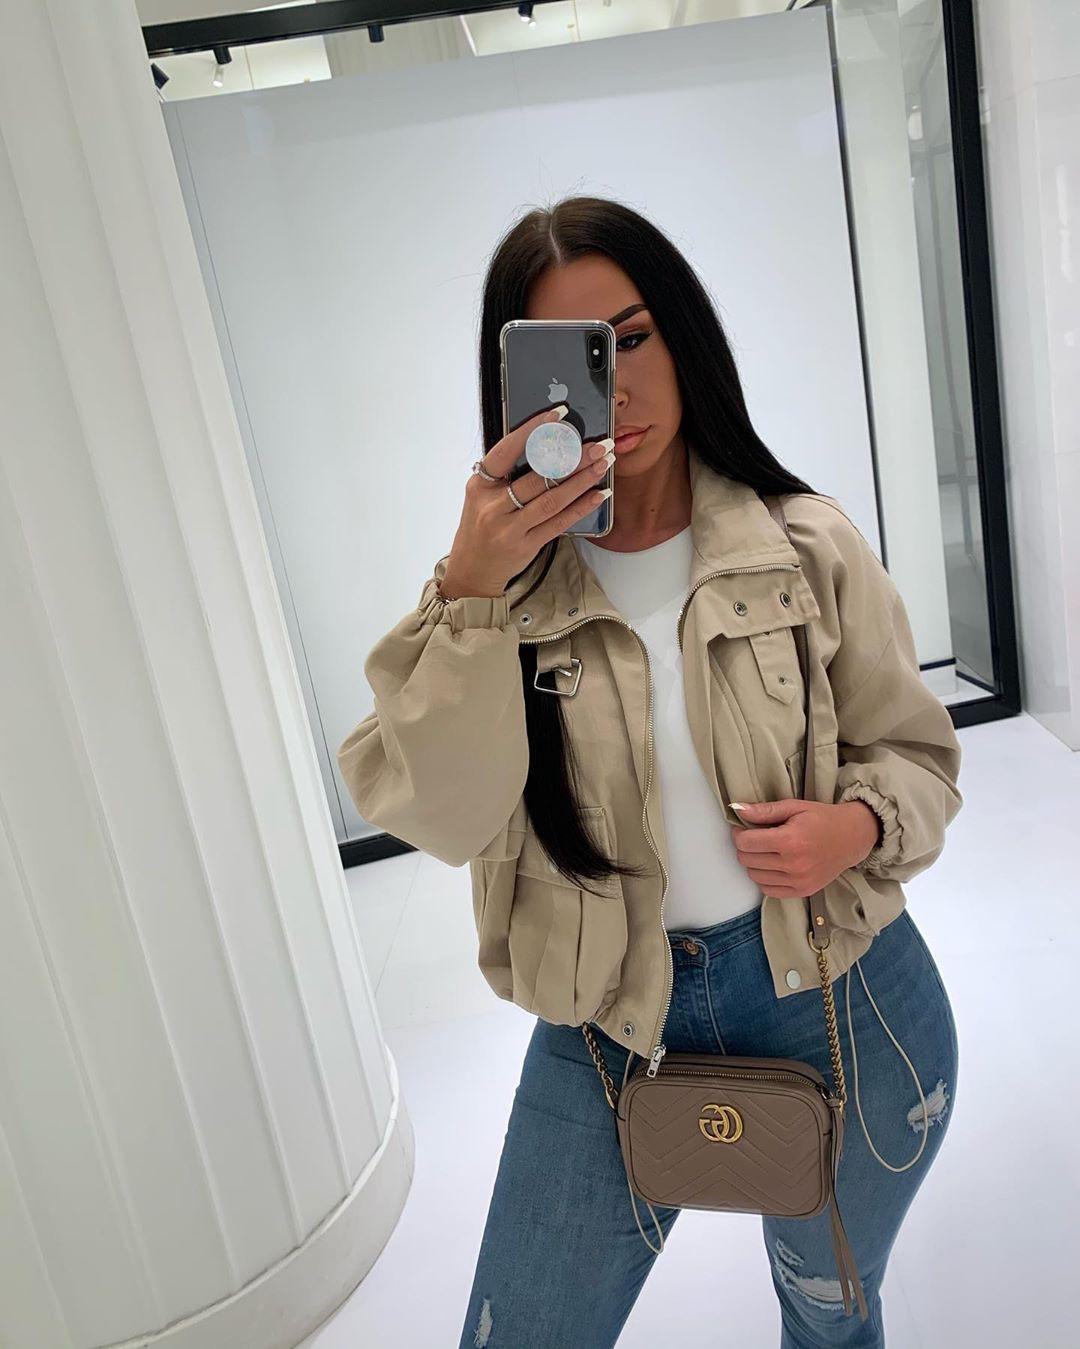 Beige and khaki trench coat, jeans, coat